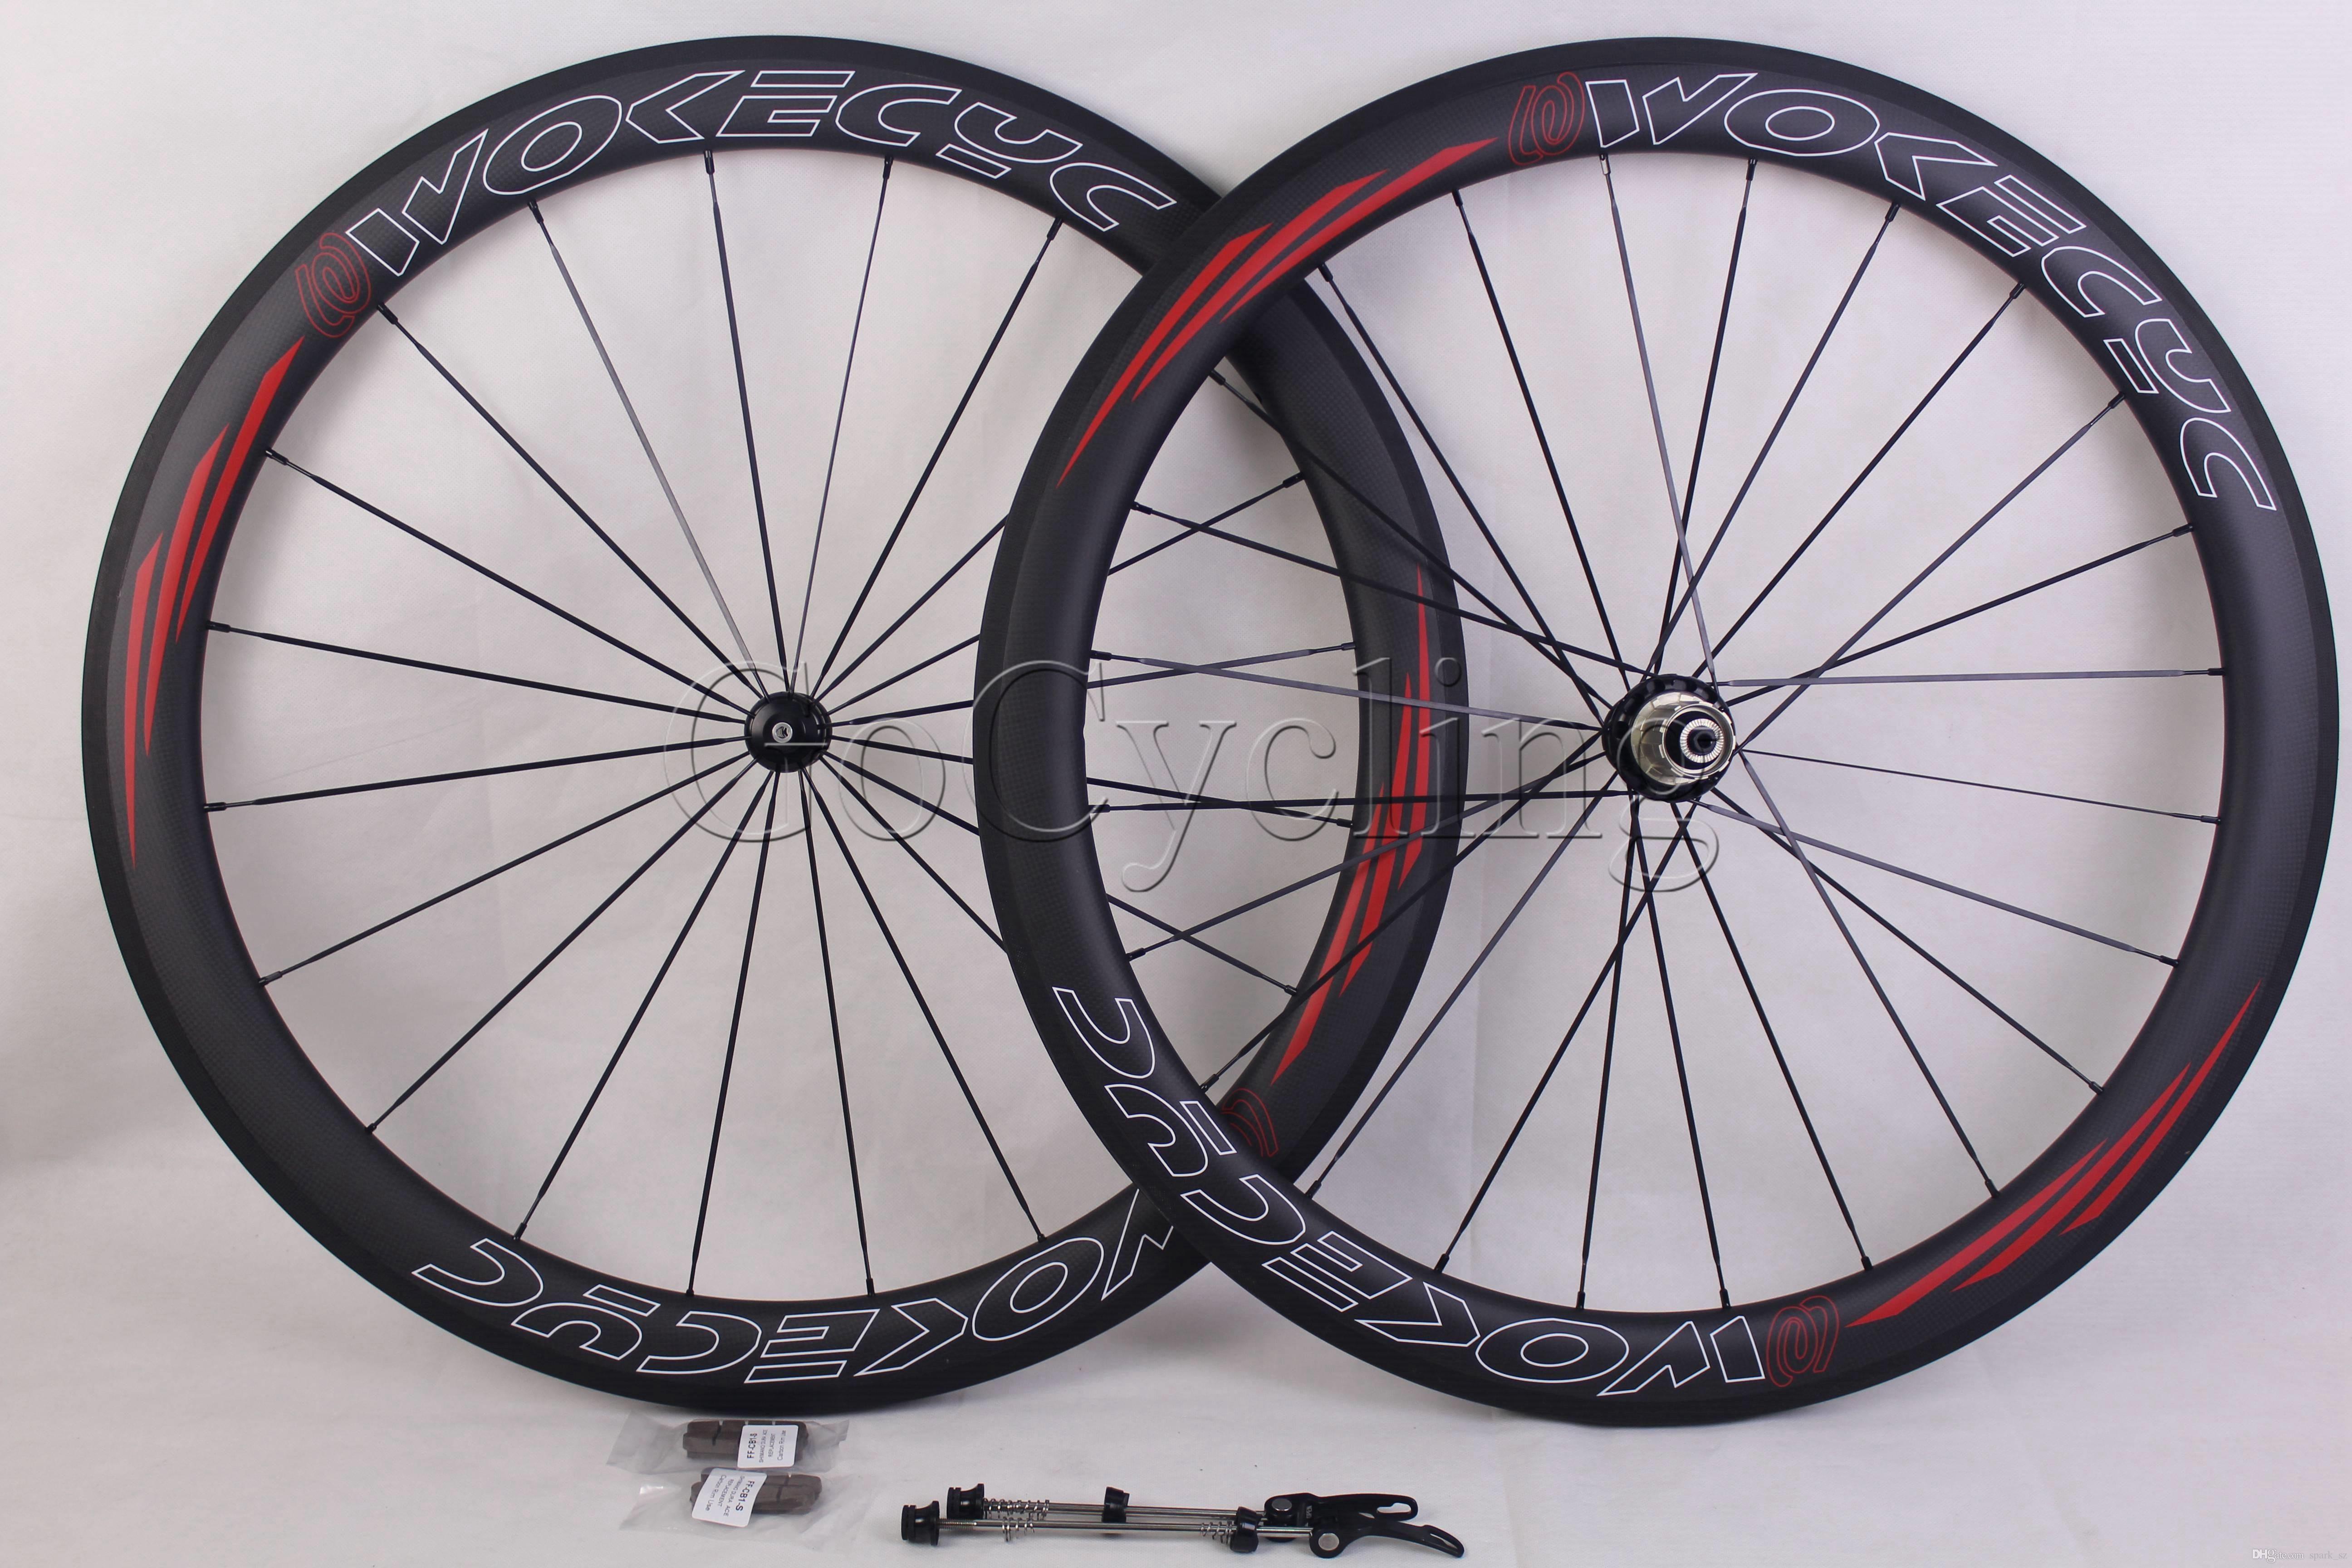 carbon bicycle wheels with Carbon Hub R36 Basalt brake surfce rim depth 50mm clincher tubular road cycling bike racing wheelset 700C